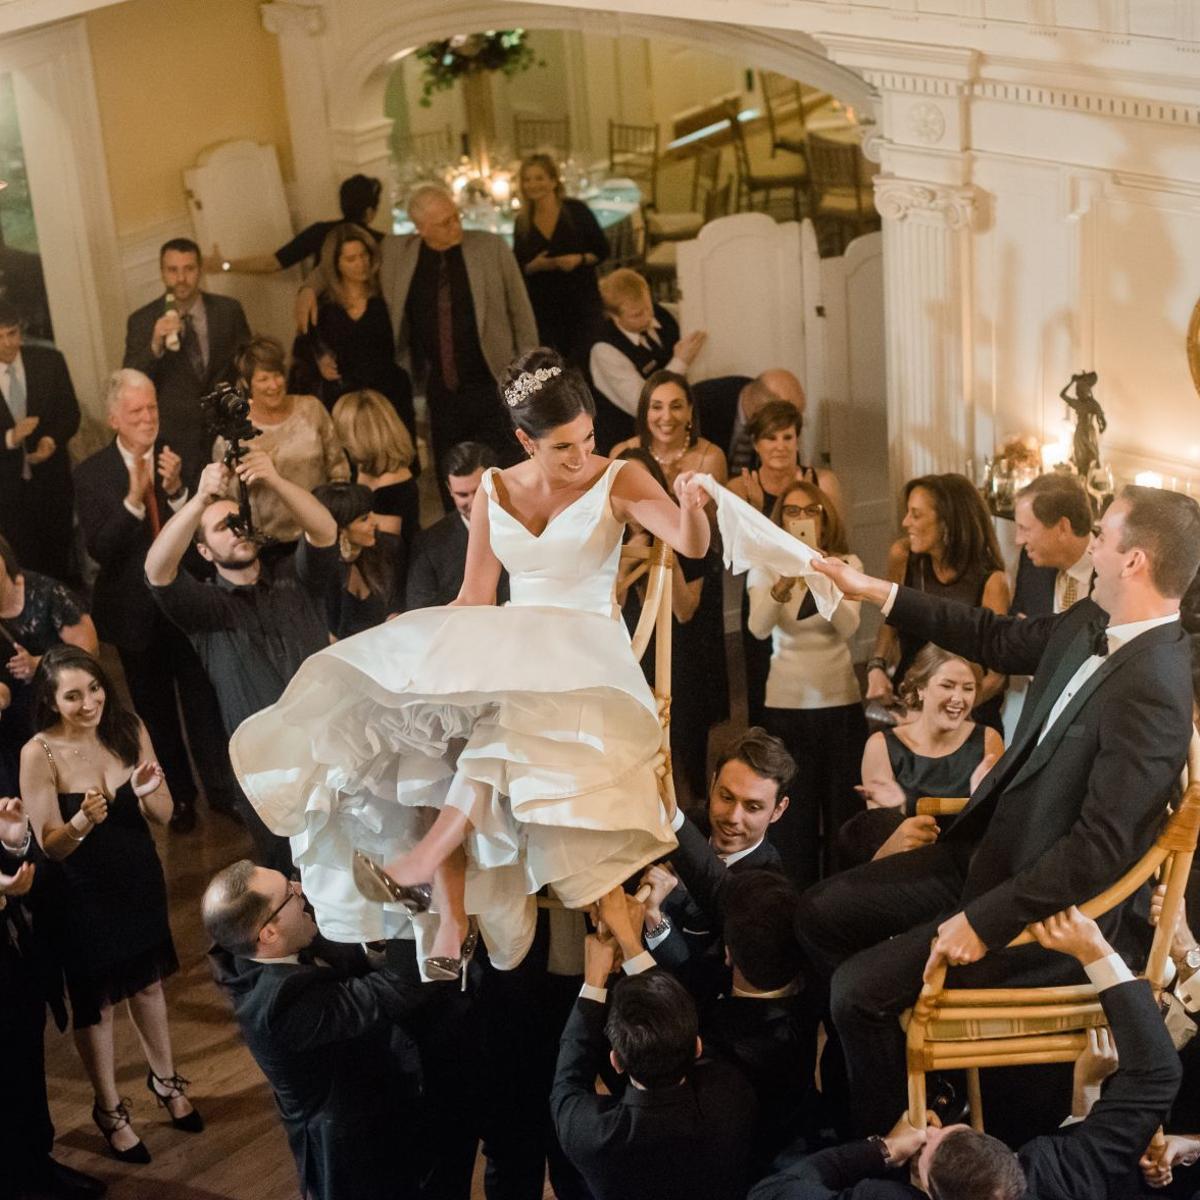 Scheidt Stein Wedding O R Weddings Magazine Observer Reporter Com